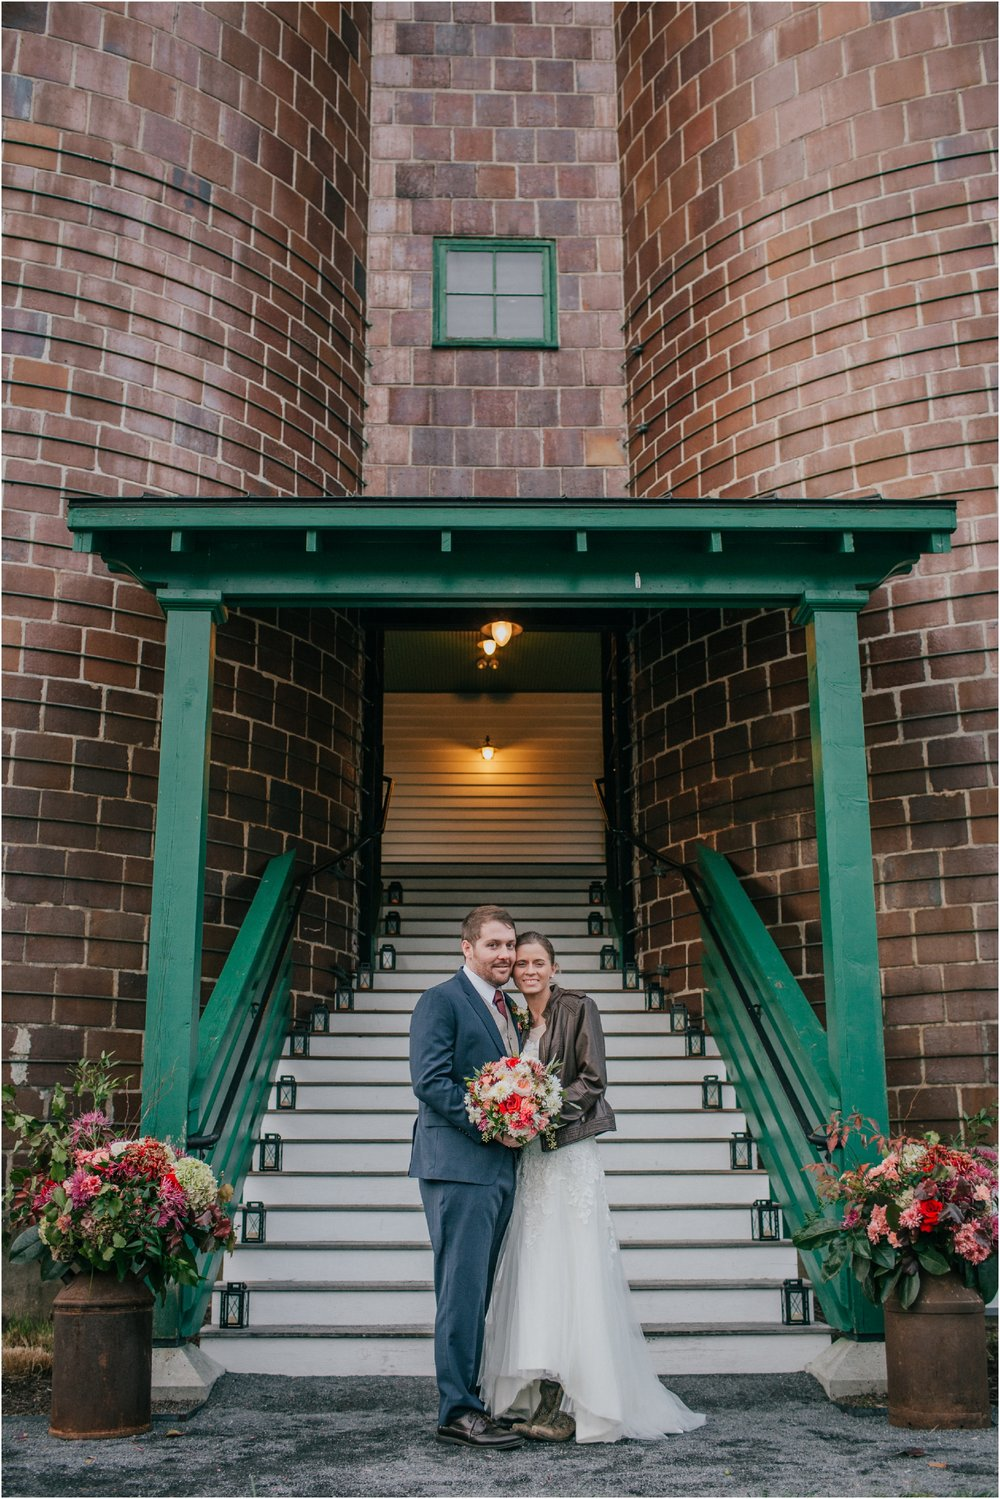 warm-springs-old-dairy-virginia-rustic-wedding-northeast-tennessee-elopement-adventuruous-photographer-katy-sergent_0096.jpg